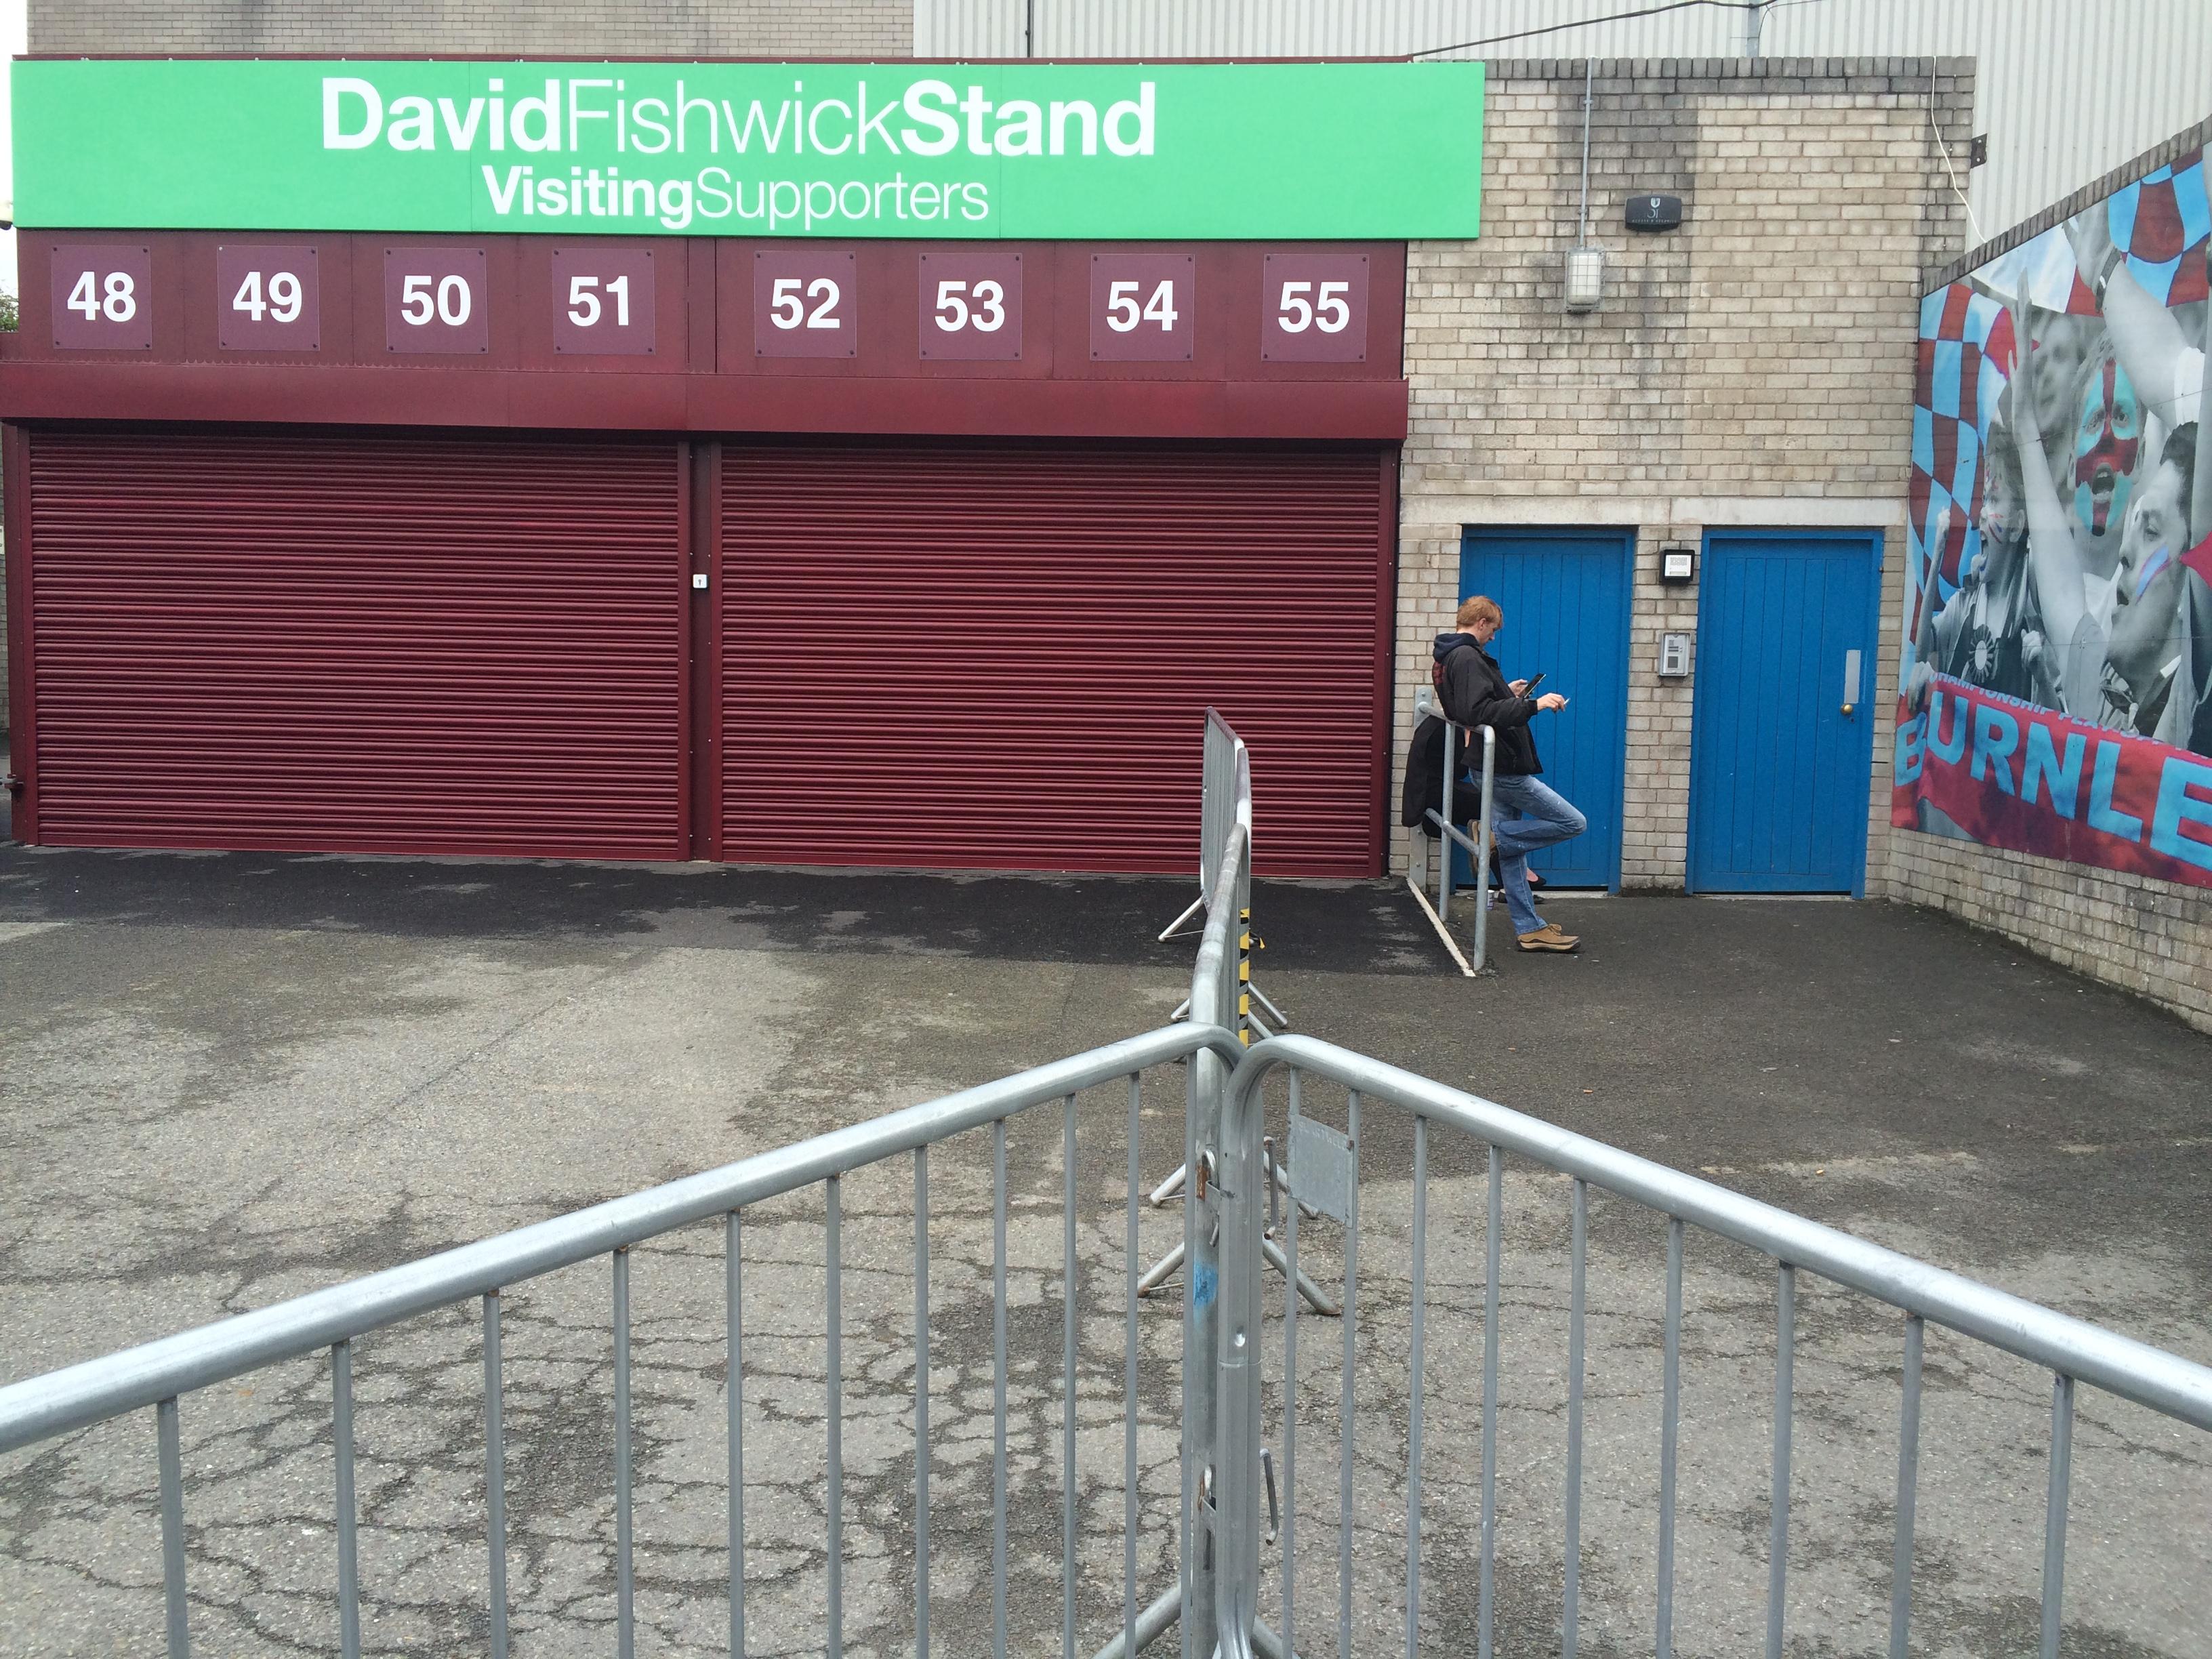 Away Fans entrance